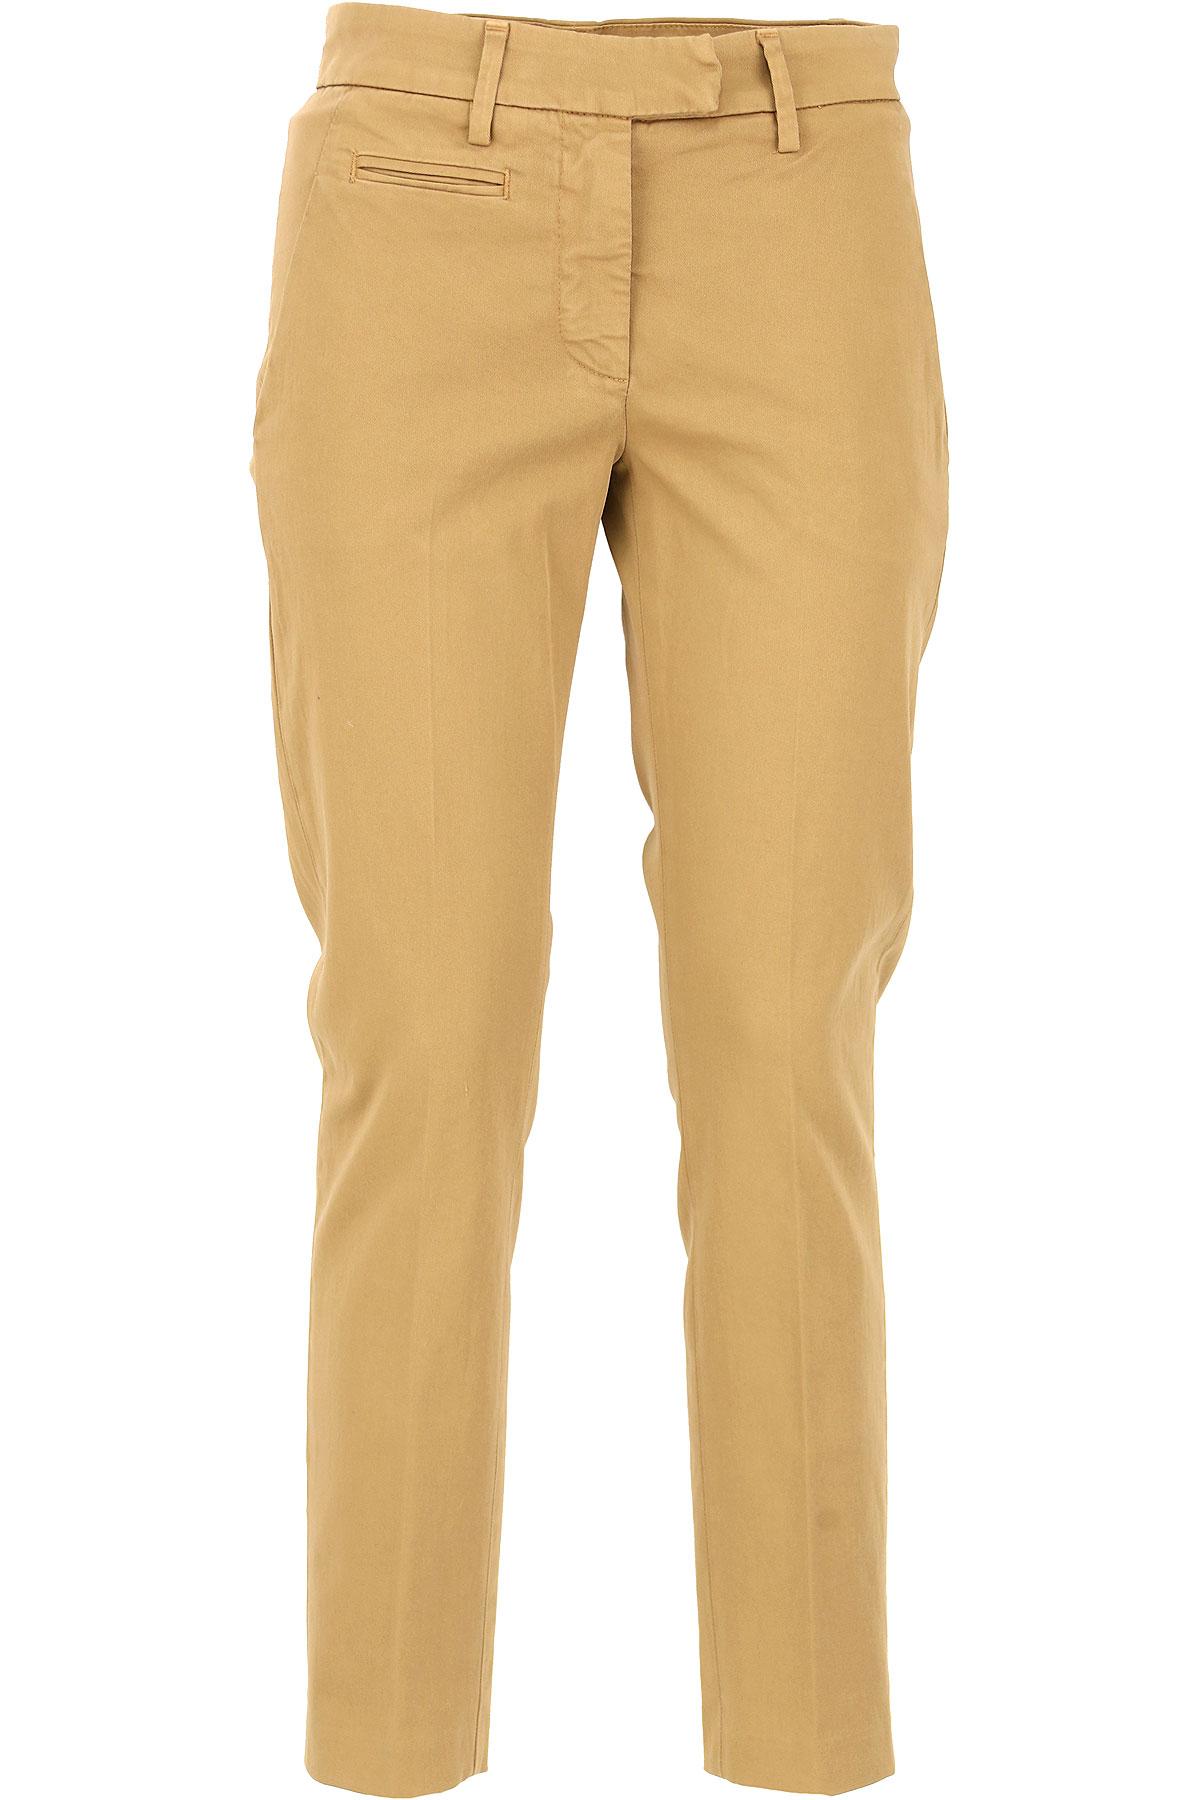 Dondup Pants for Women On Sale, Camel, Cotton, 2017, 25 26 27 28